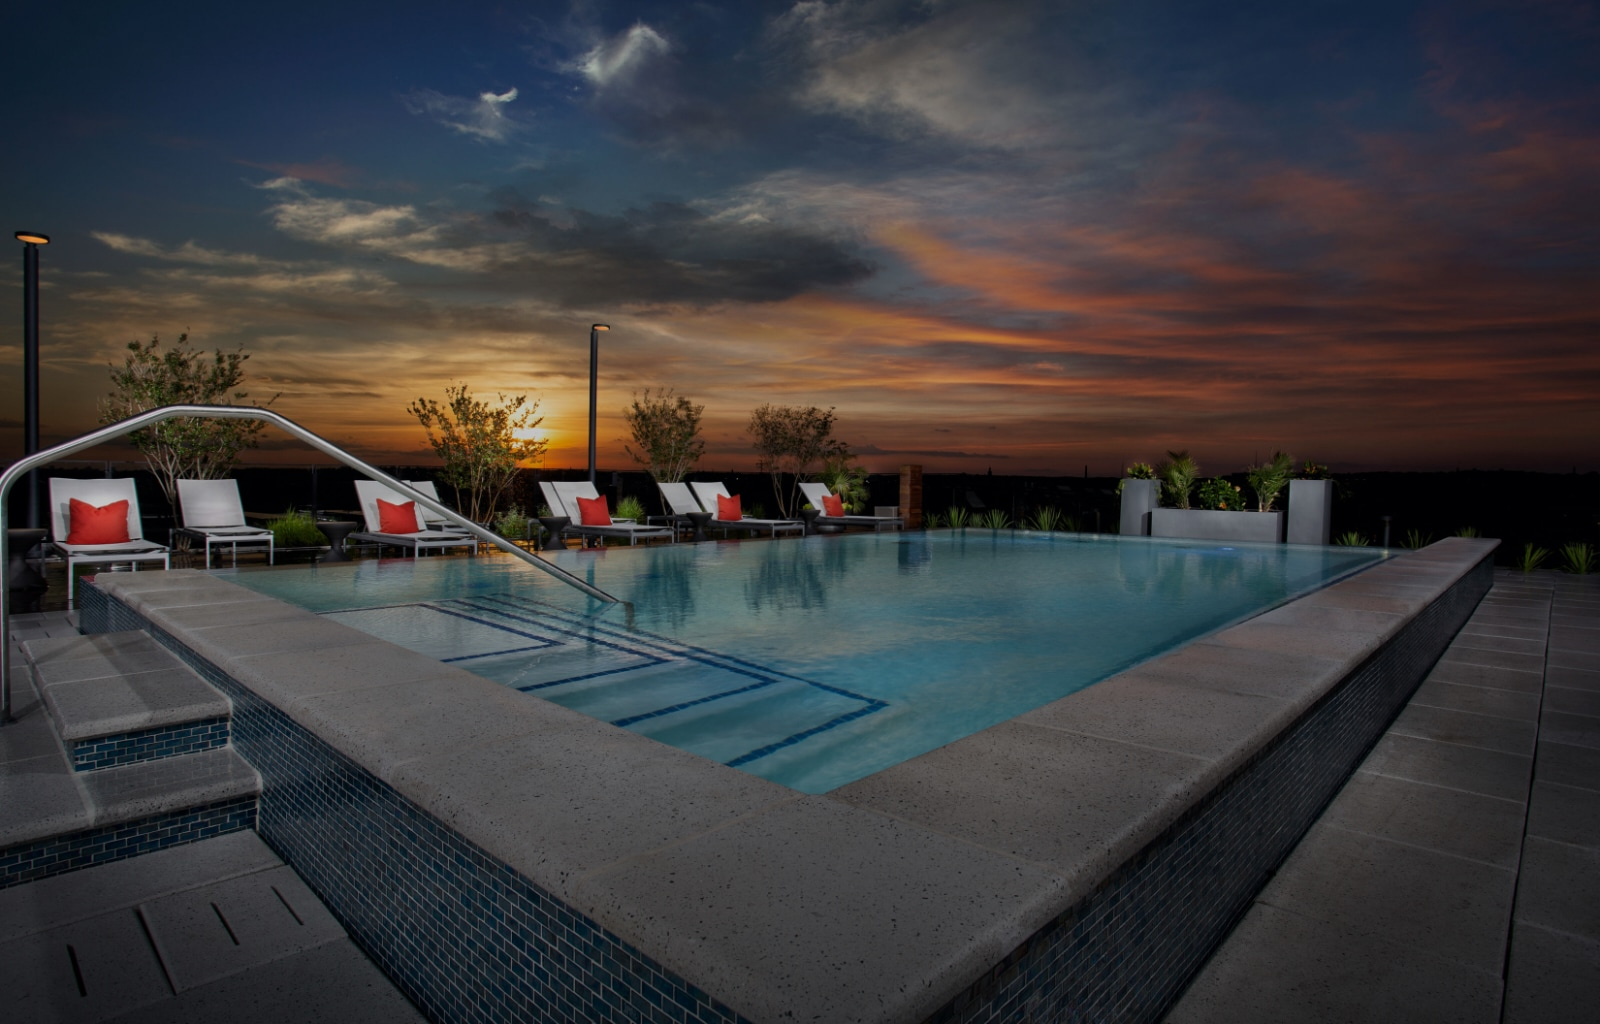 Rooftop pool at the Belgard NoMa